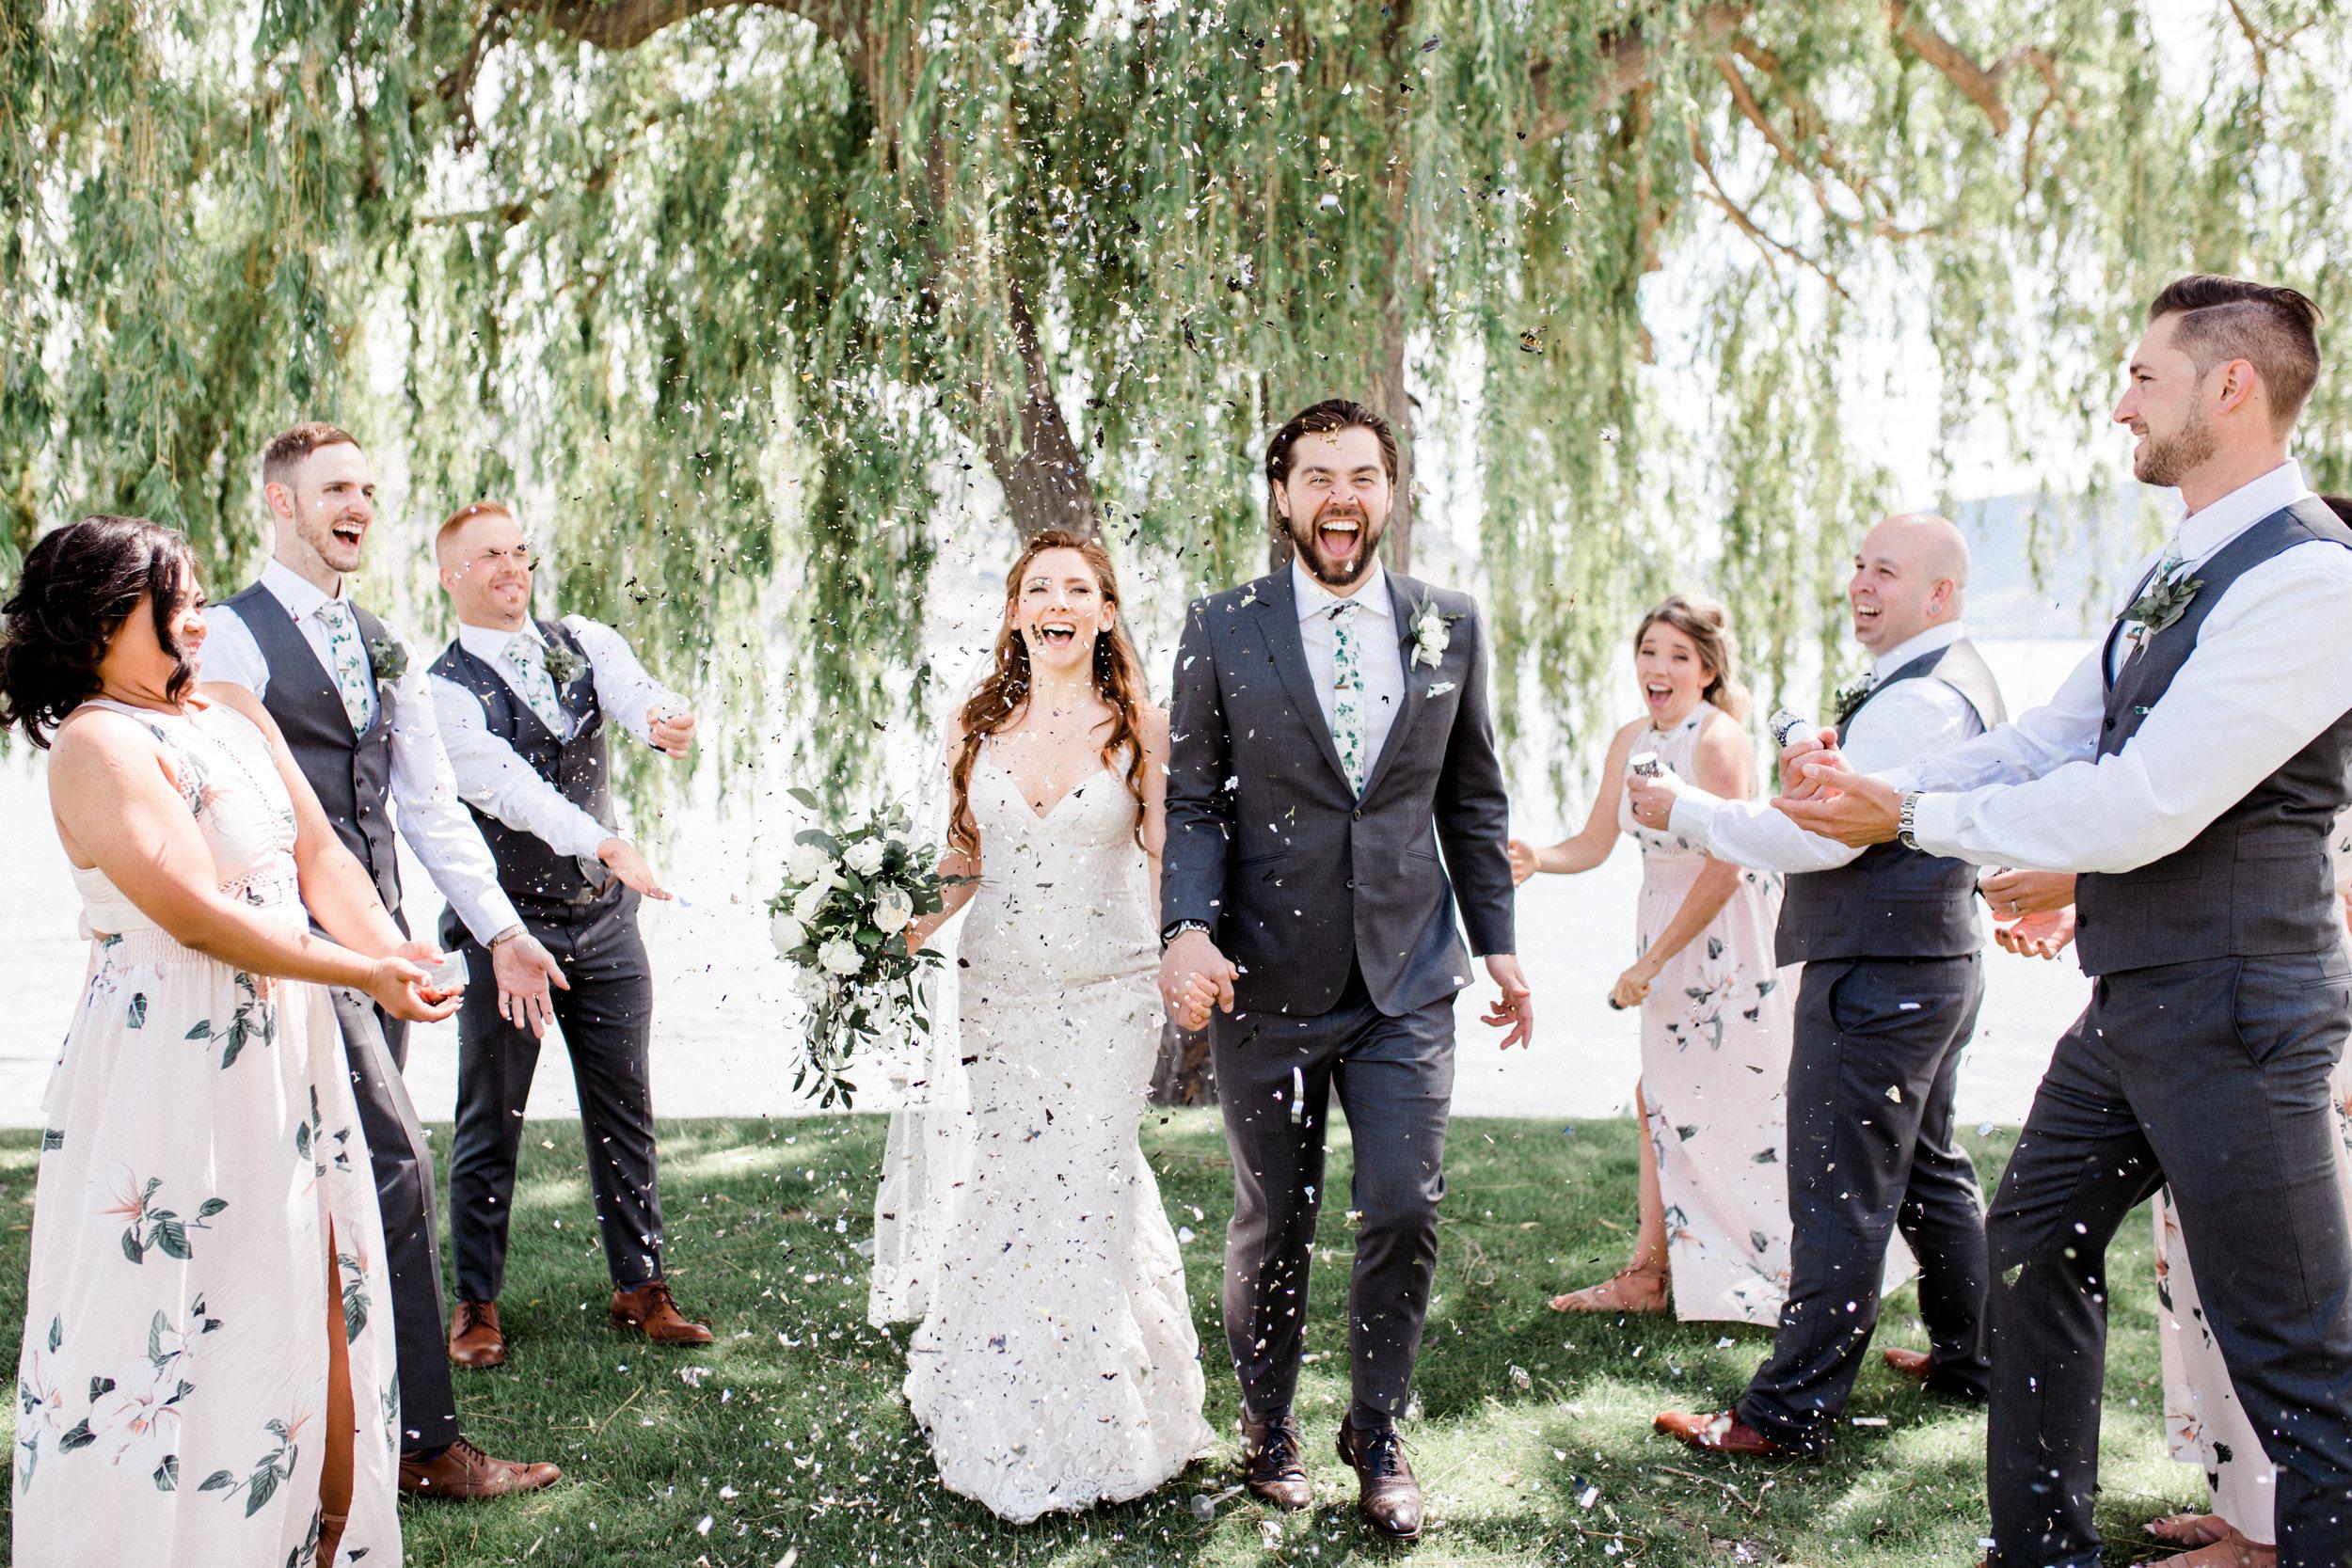 rachel-curtis-wedding-ivyandrosephoto-187.jpg